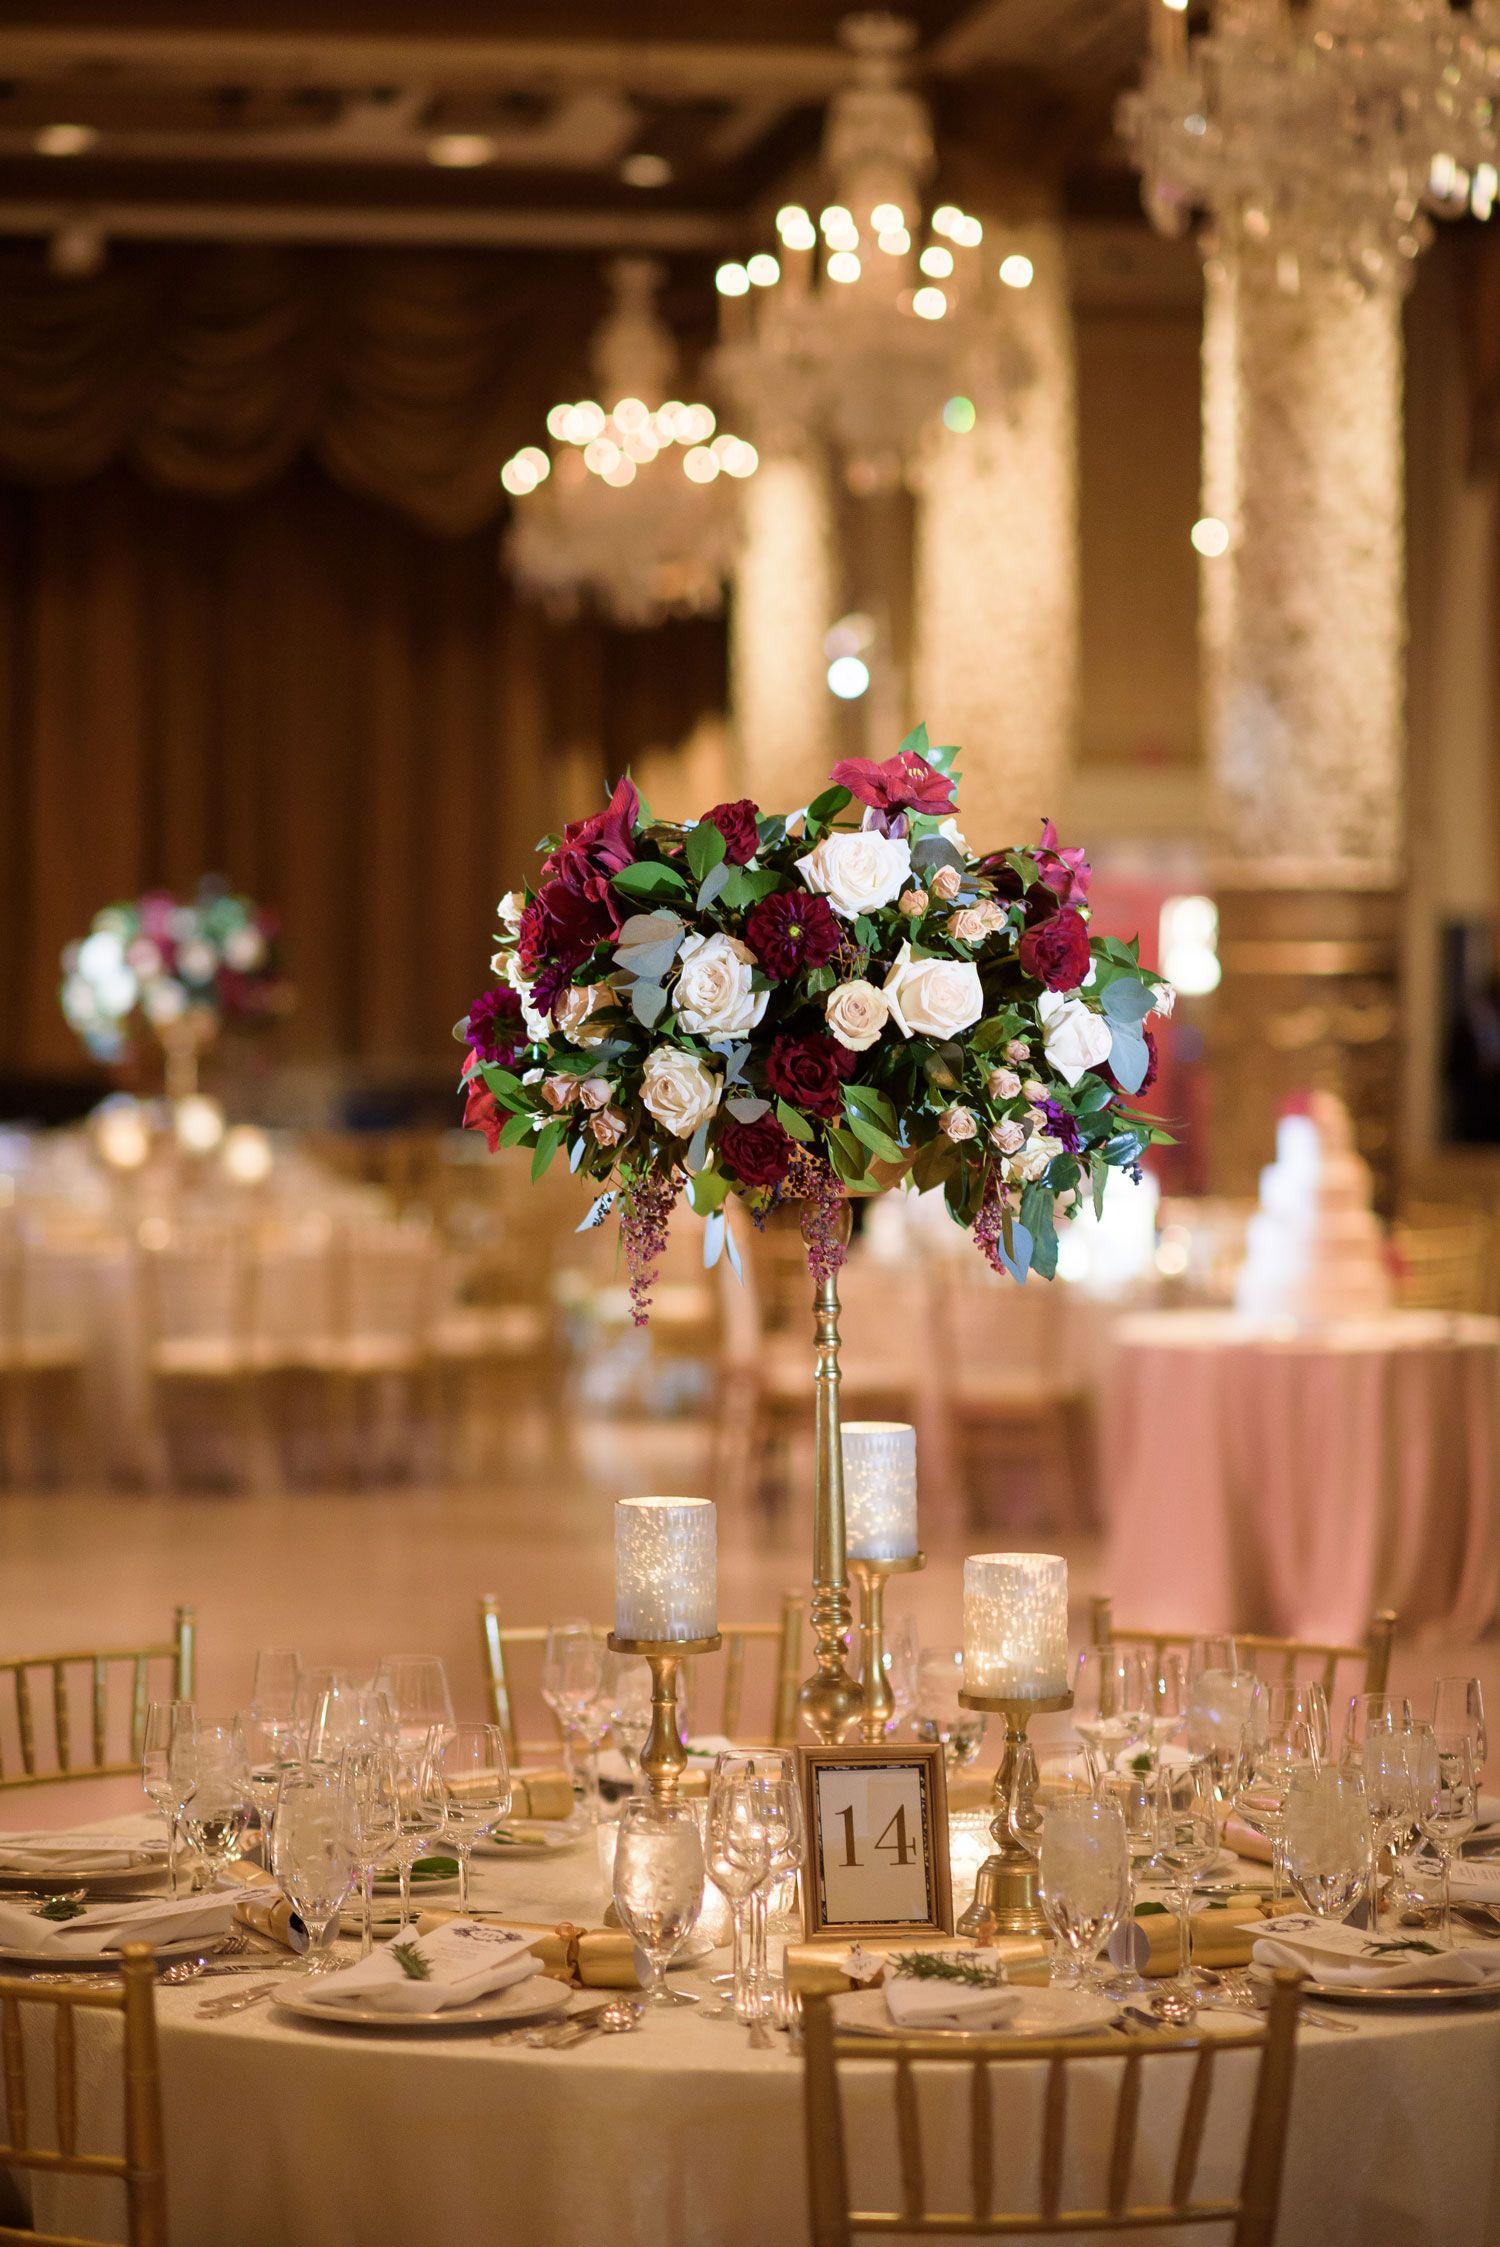 English wedding decoration ideas  Catholic Winter Wedding with English Traditions in Chicago  Winter